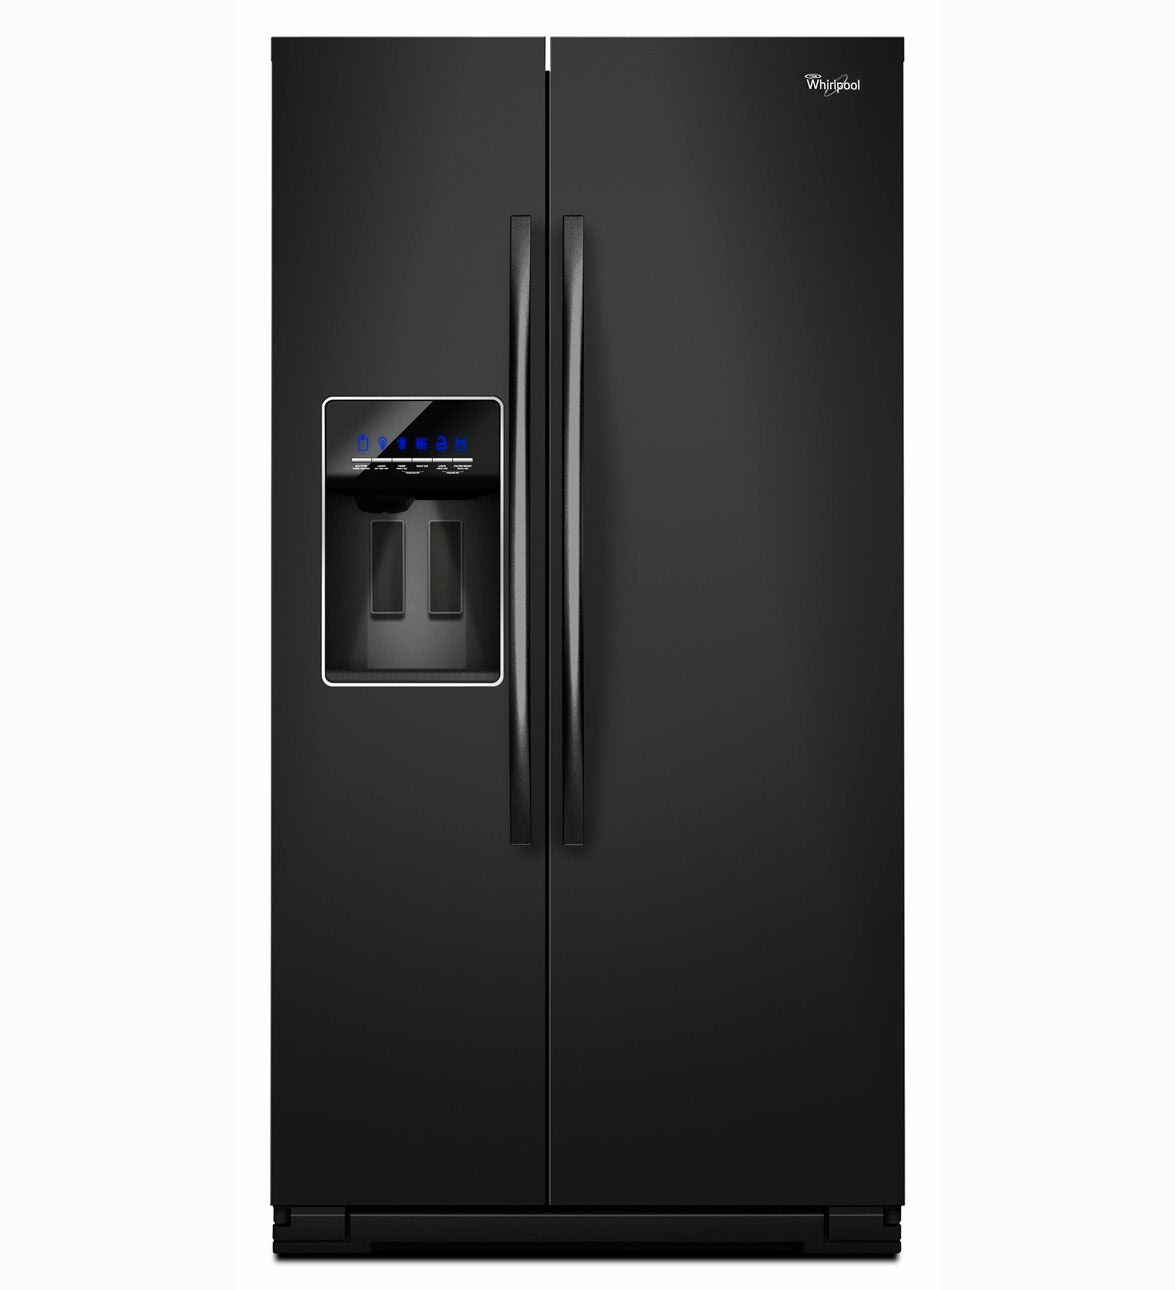 Whirlpool Refrigerator Brand Whirlpool Gsf26c4exb Gold